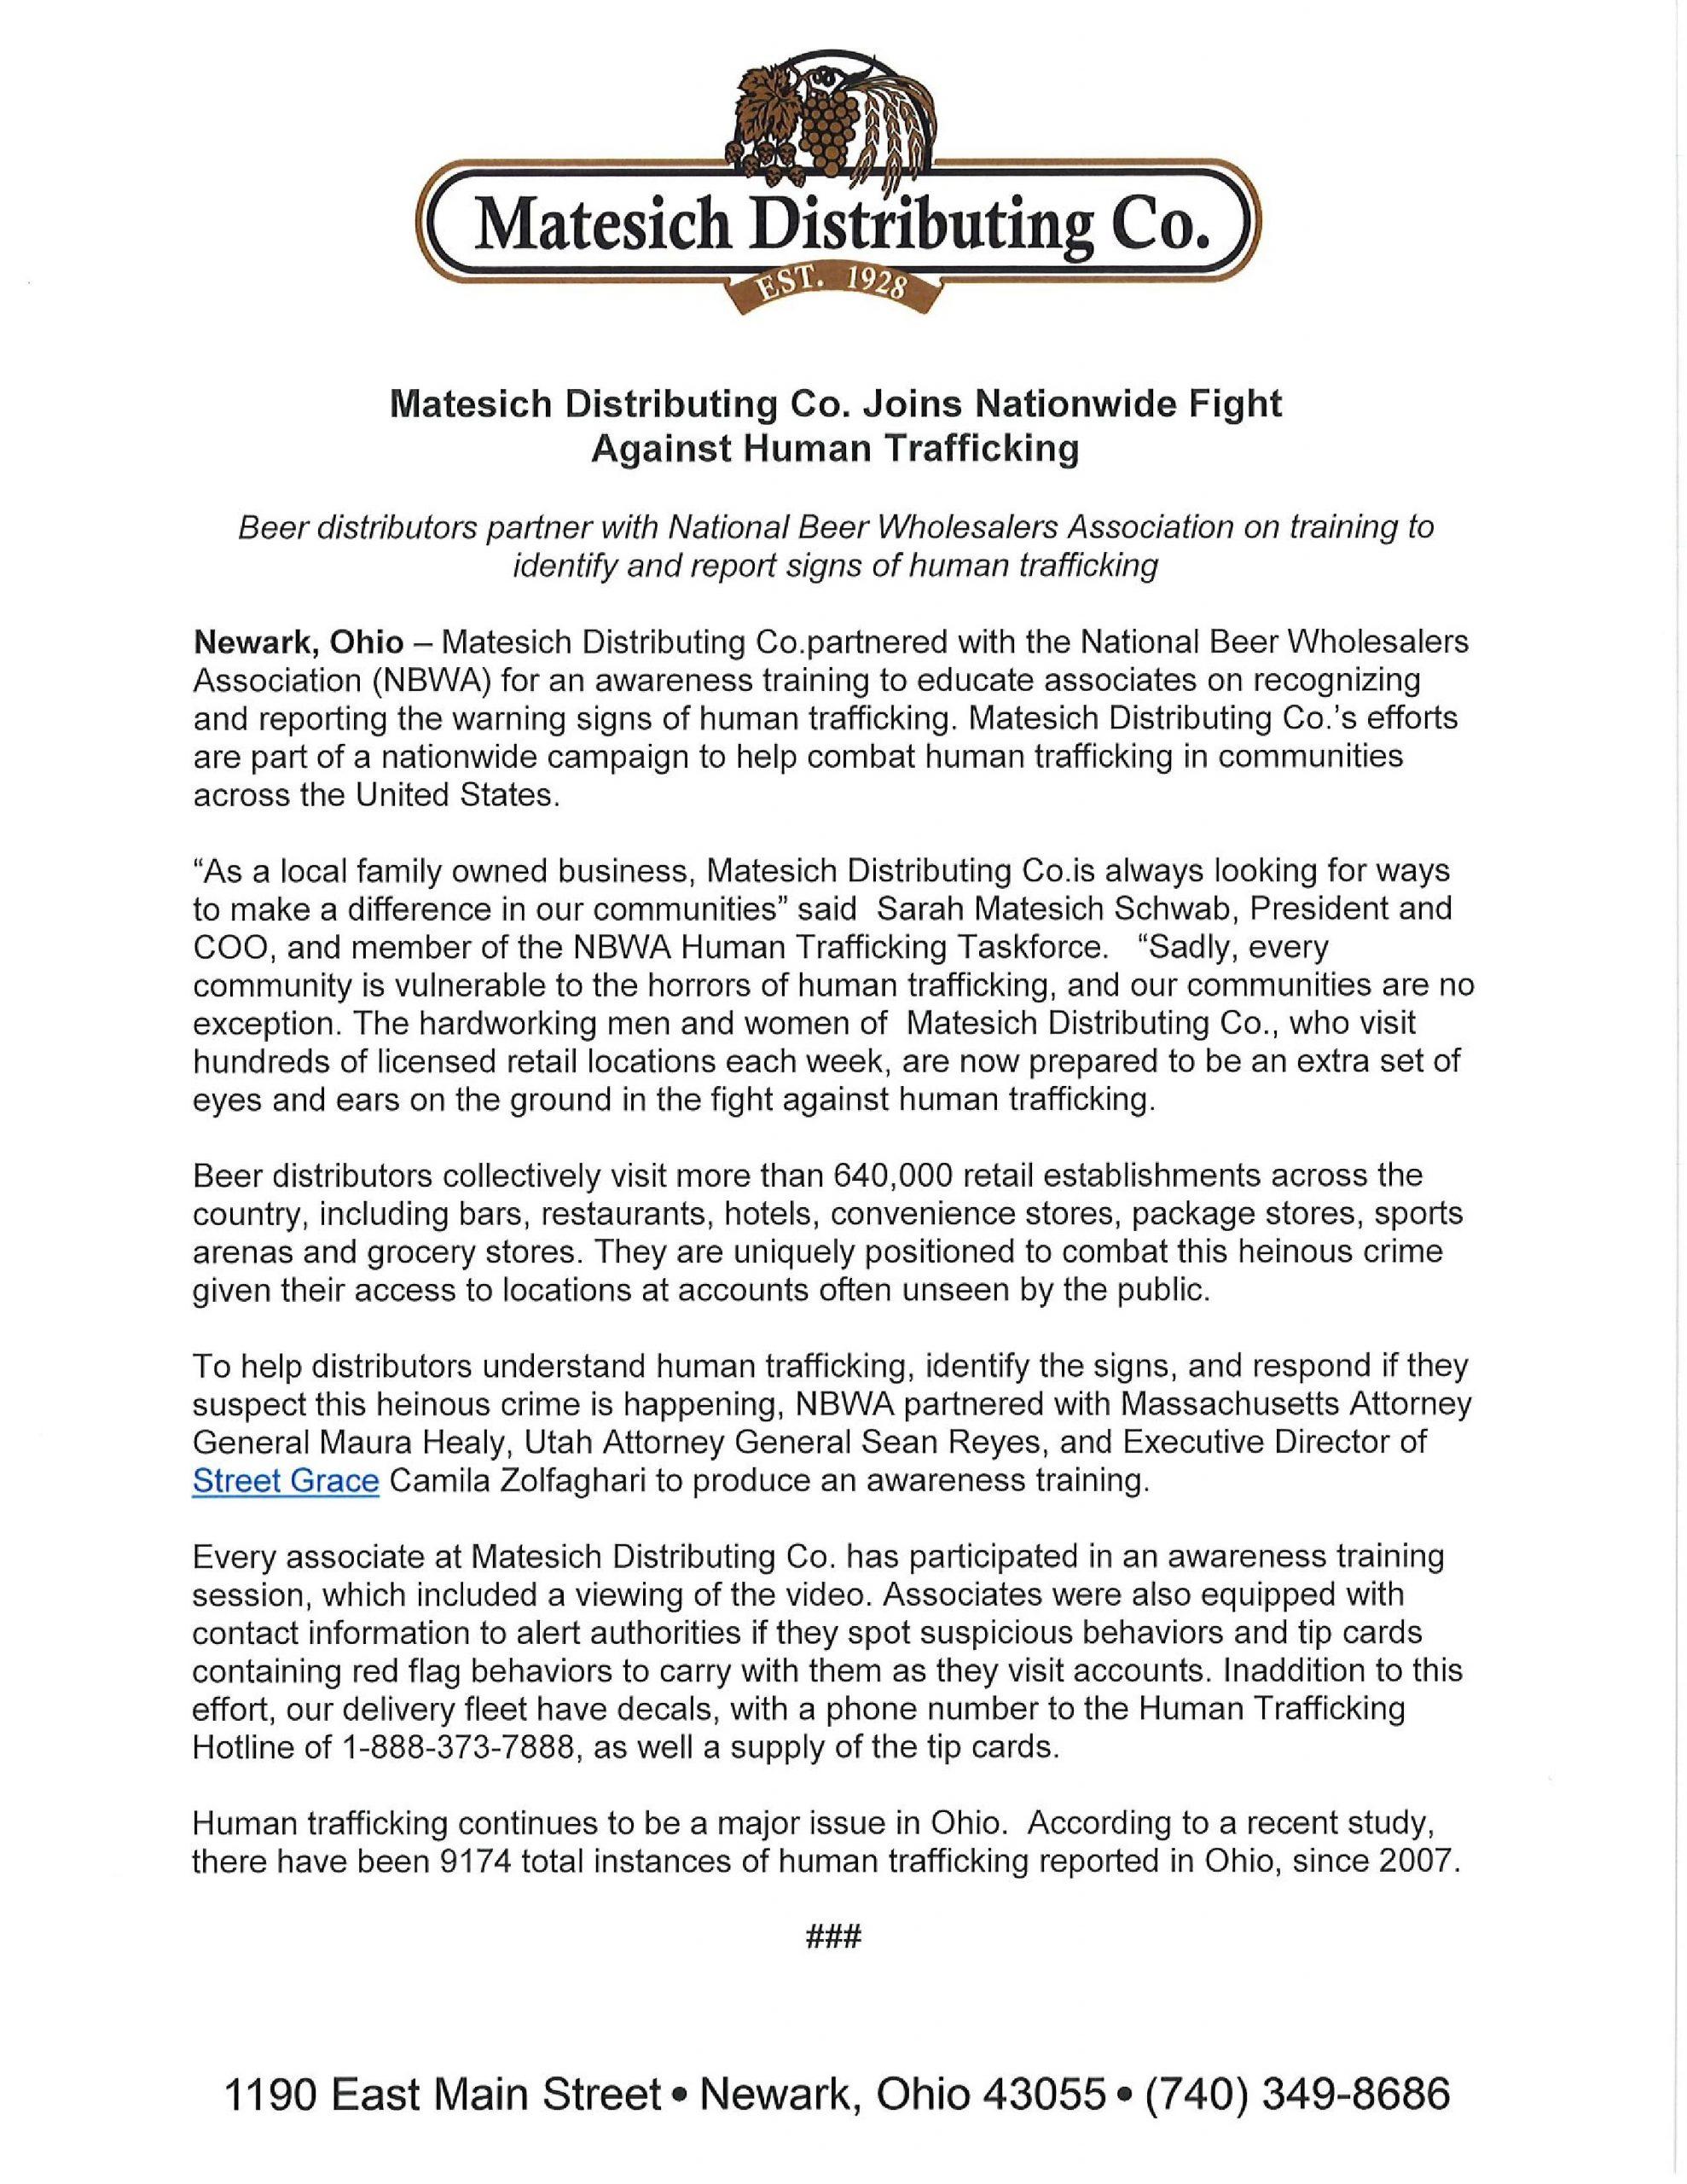 Distributors Against Human Trafficking Certified